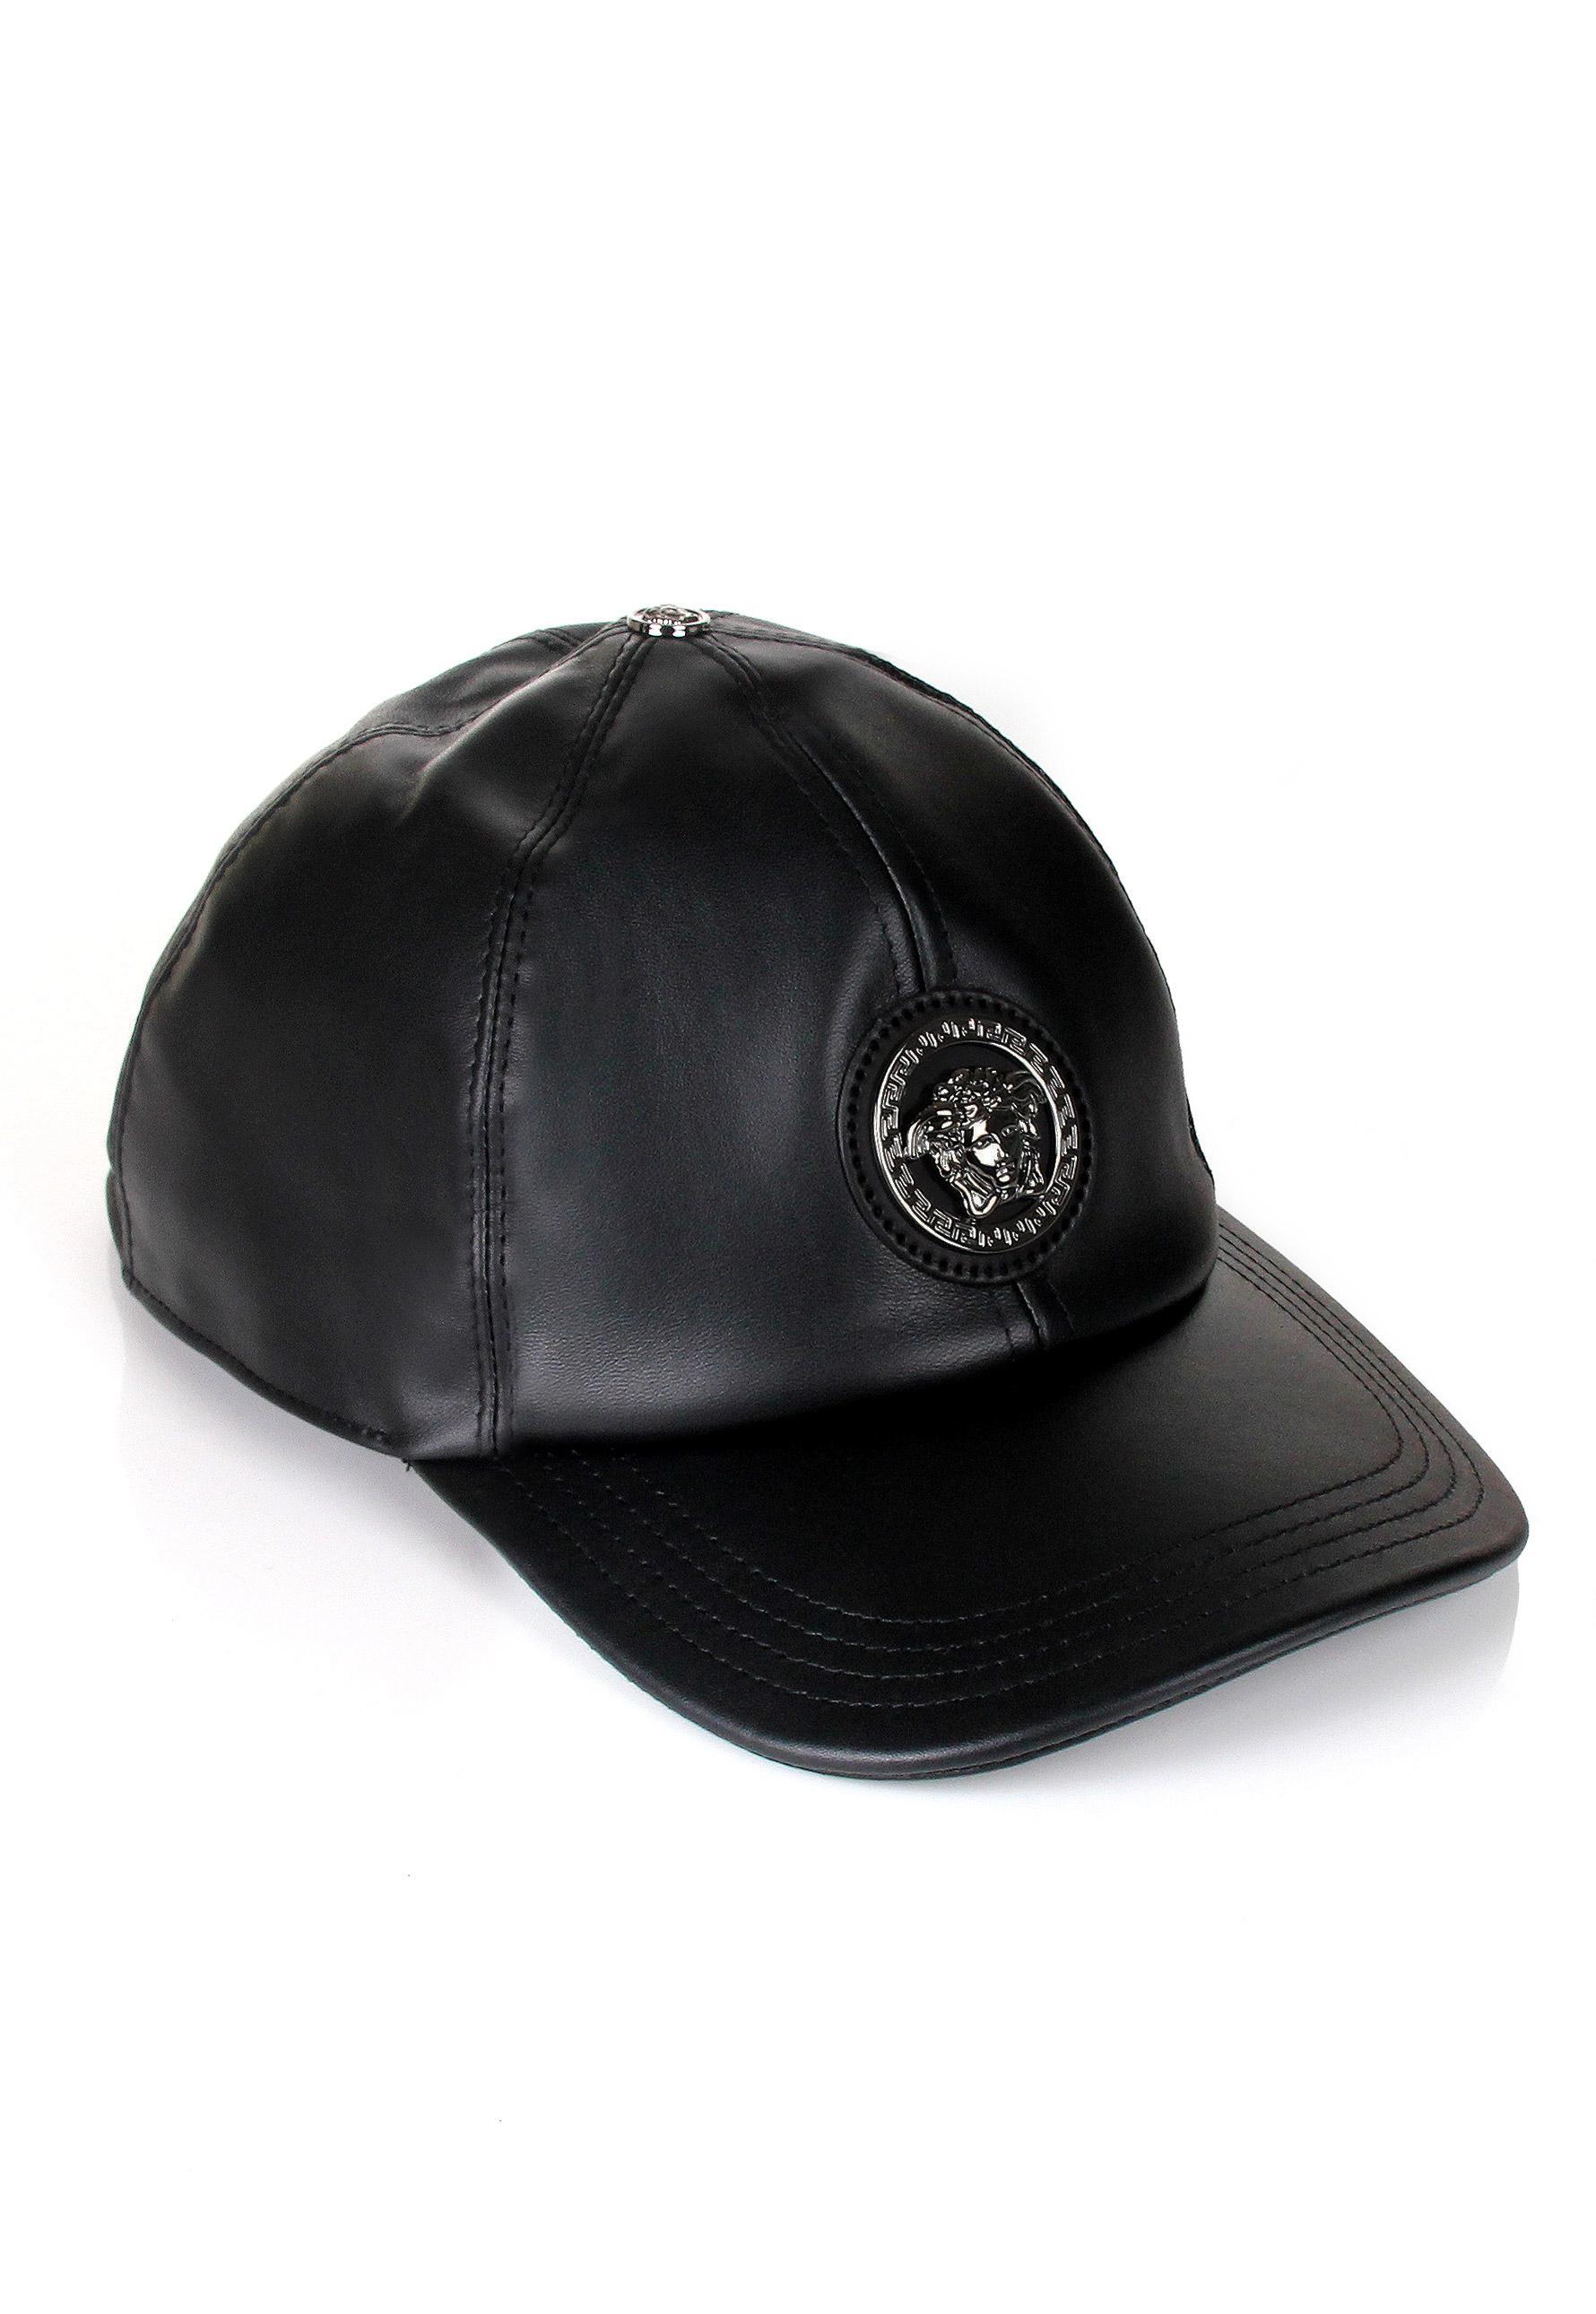 28bf91317f6 Lyst - Versace Medusa Leather Cap Black in Black for Men